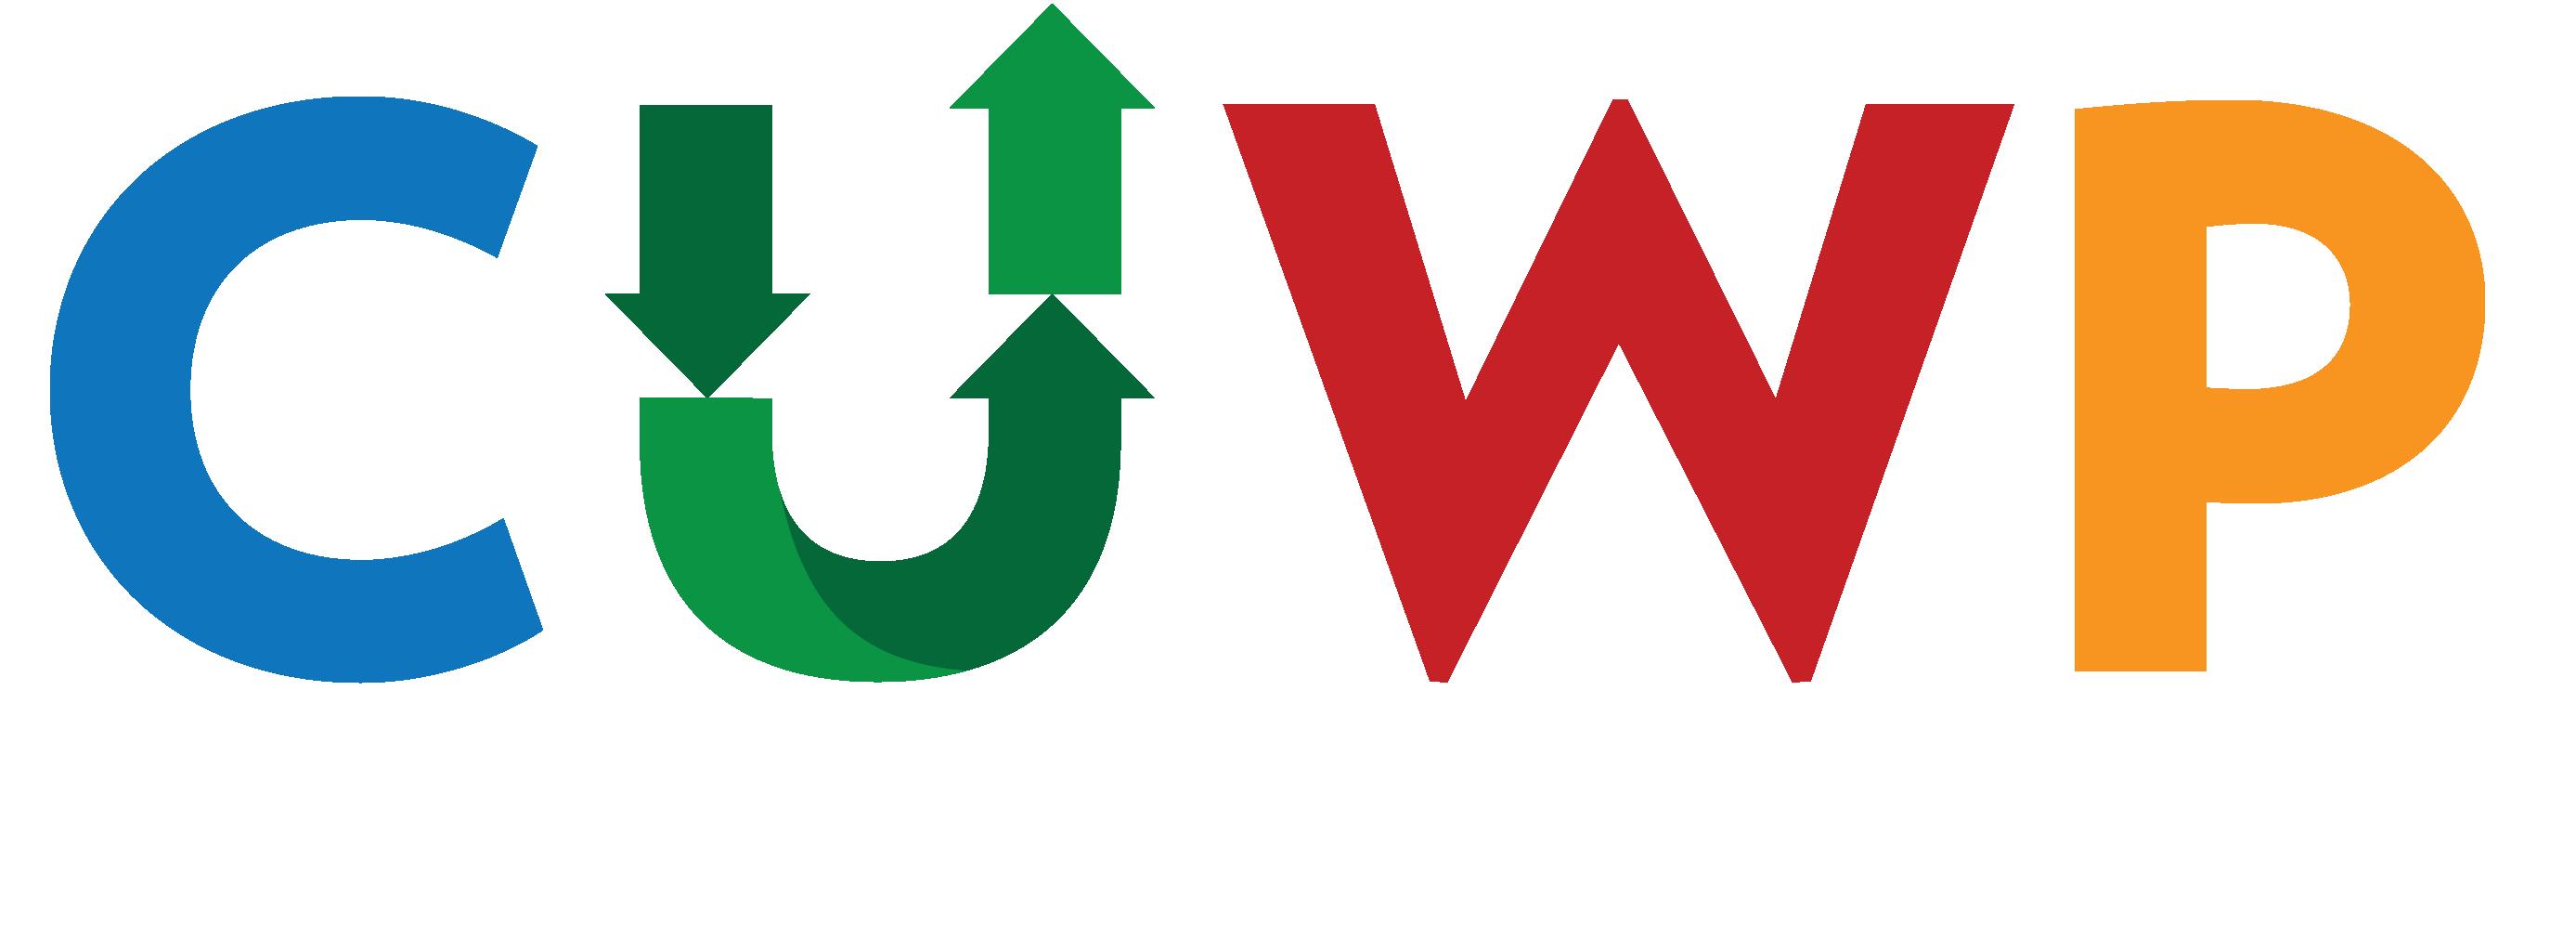 CUWP.org